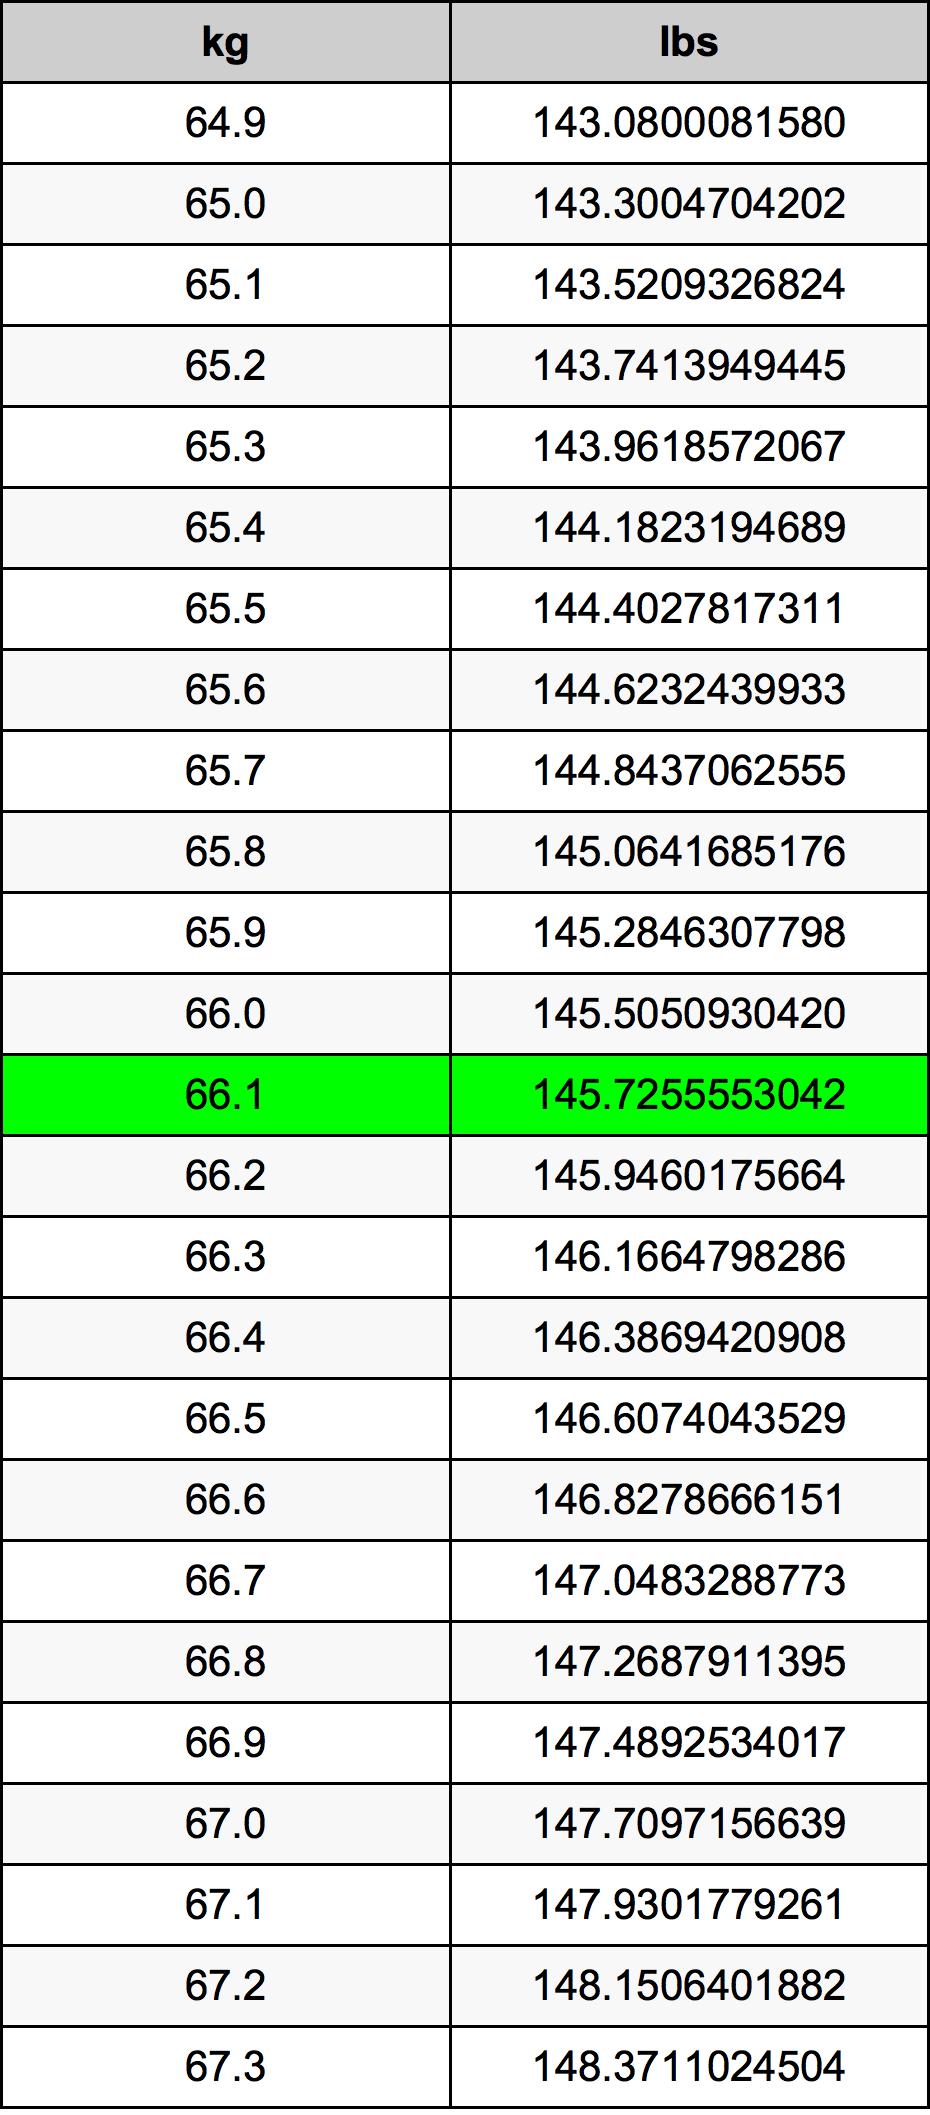 66.1 Kilogramme Table